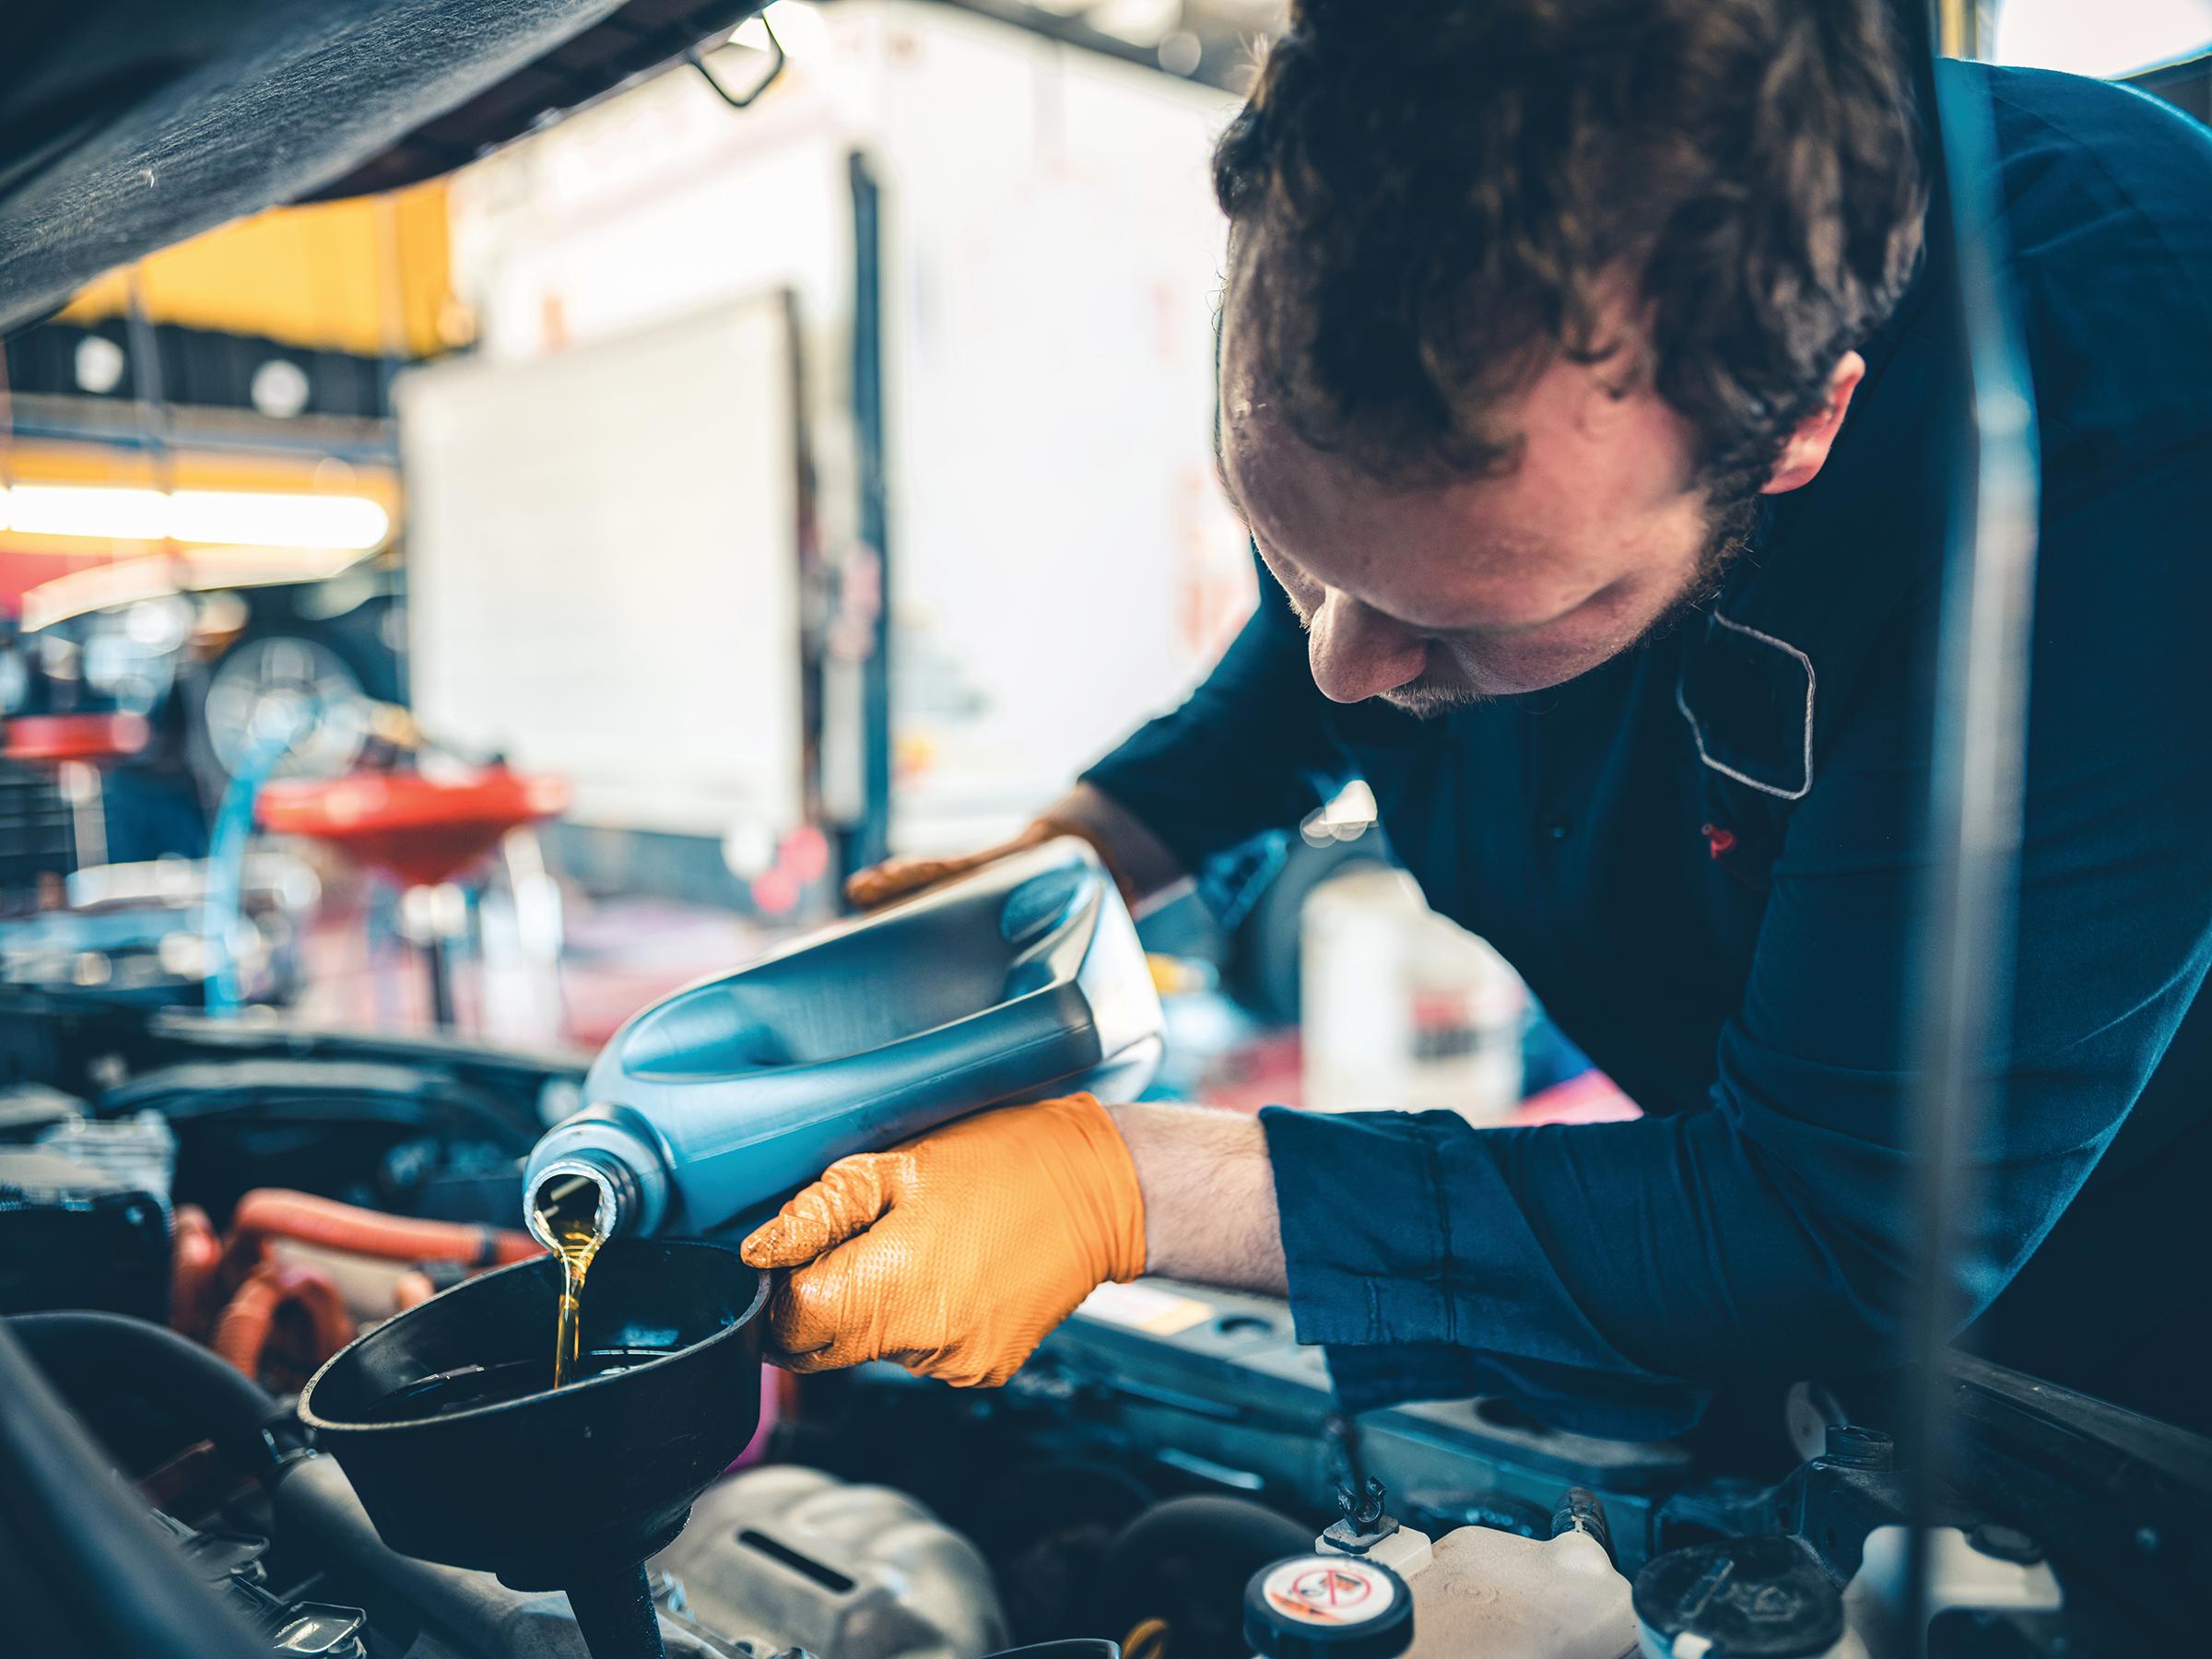 Preventative Maintenance Costs Increase 3-5% in 2021